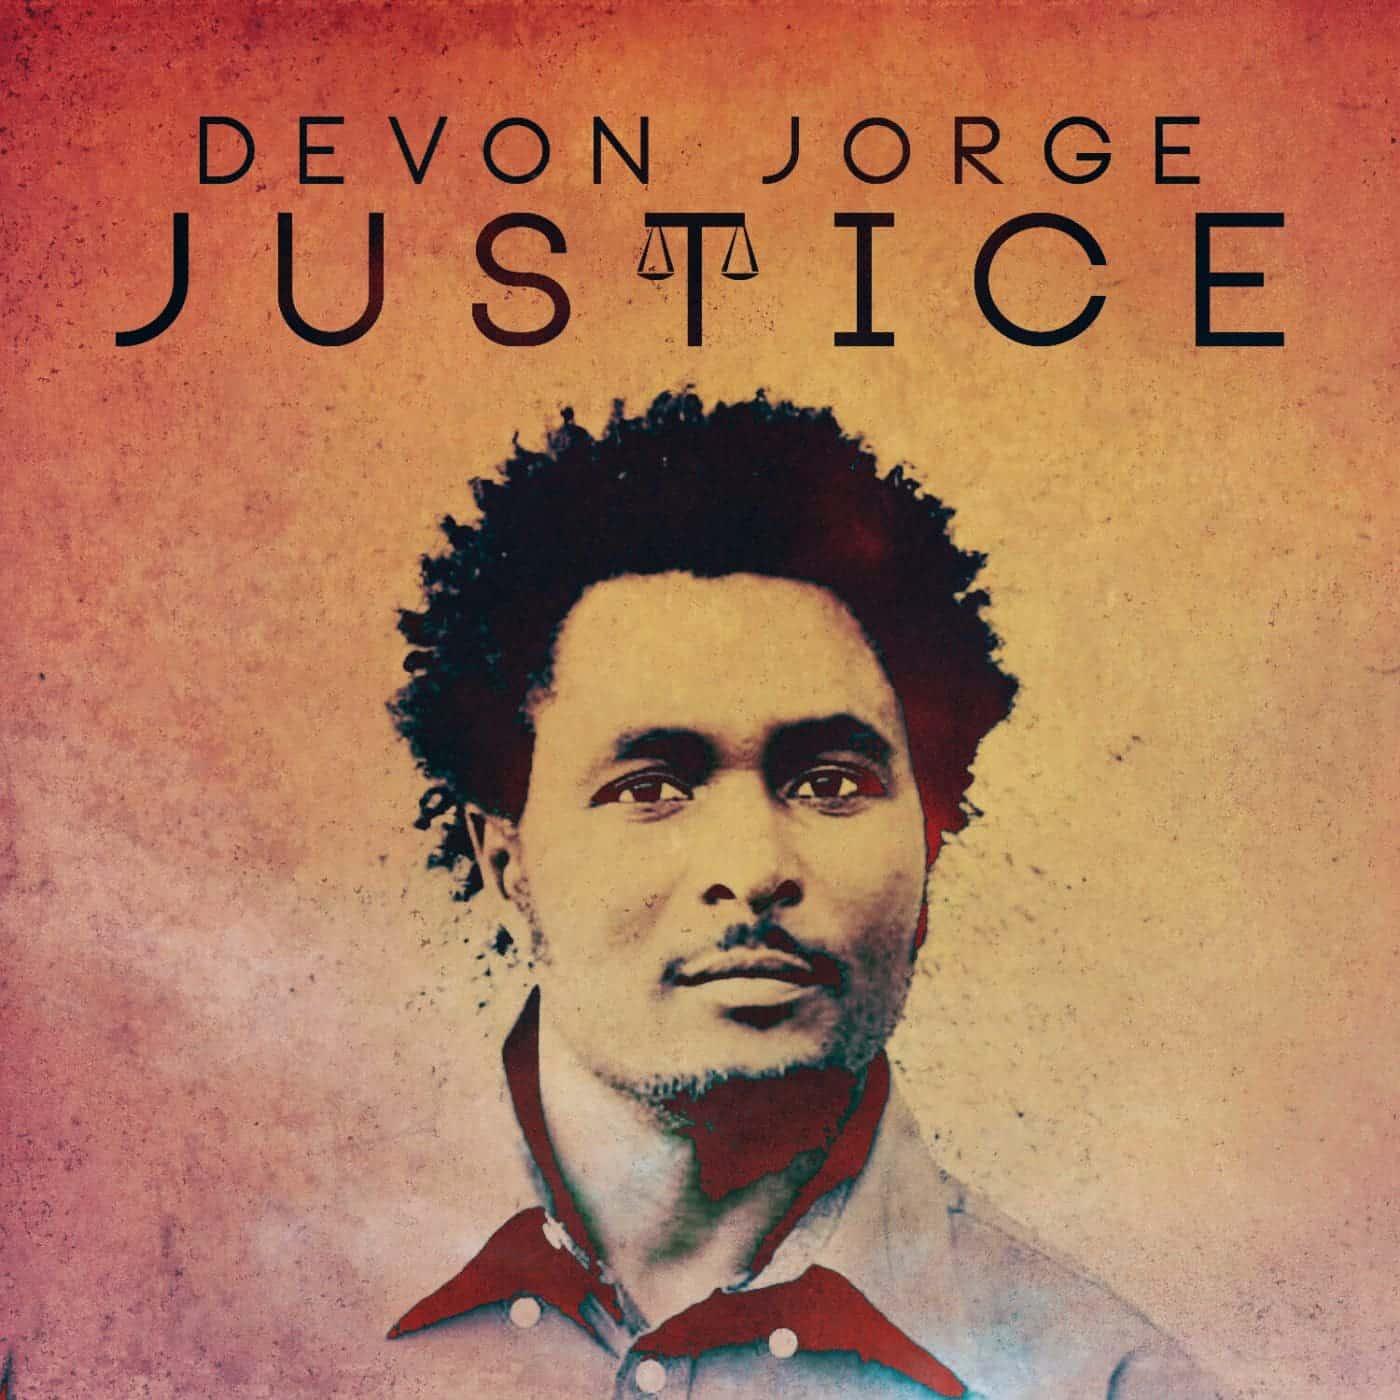 Devon Jorge - Justice - 2016 Reggae